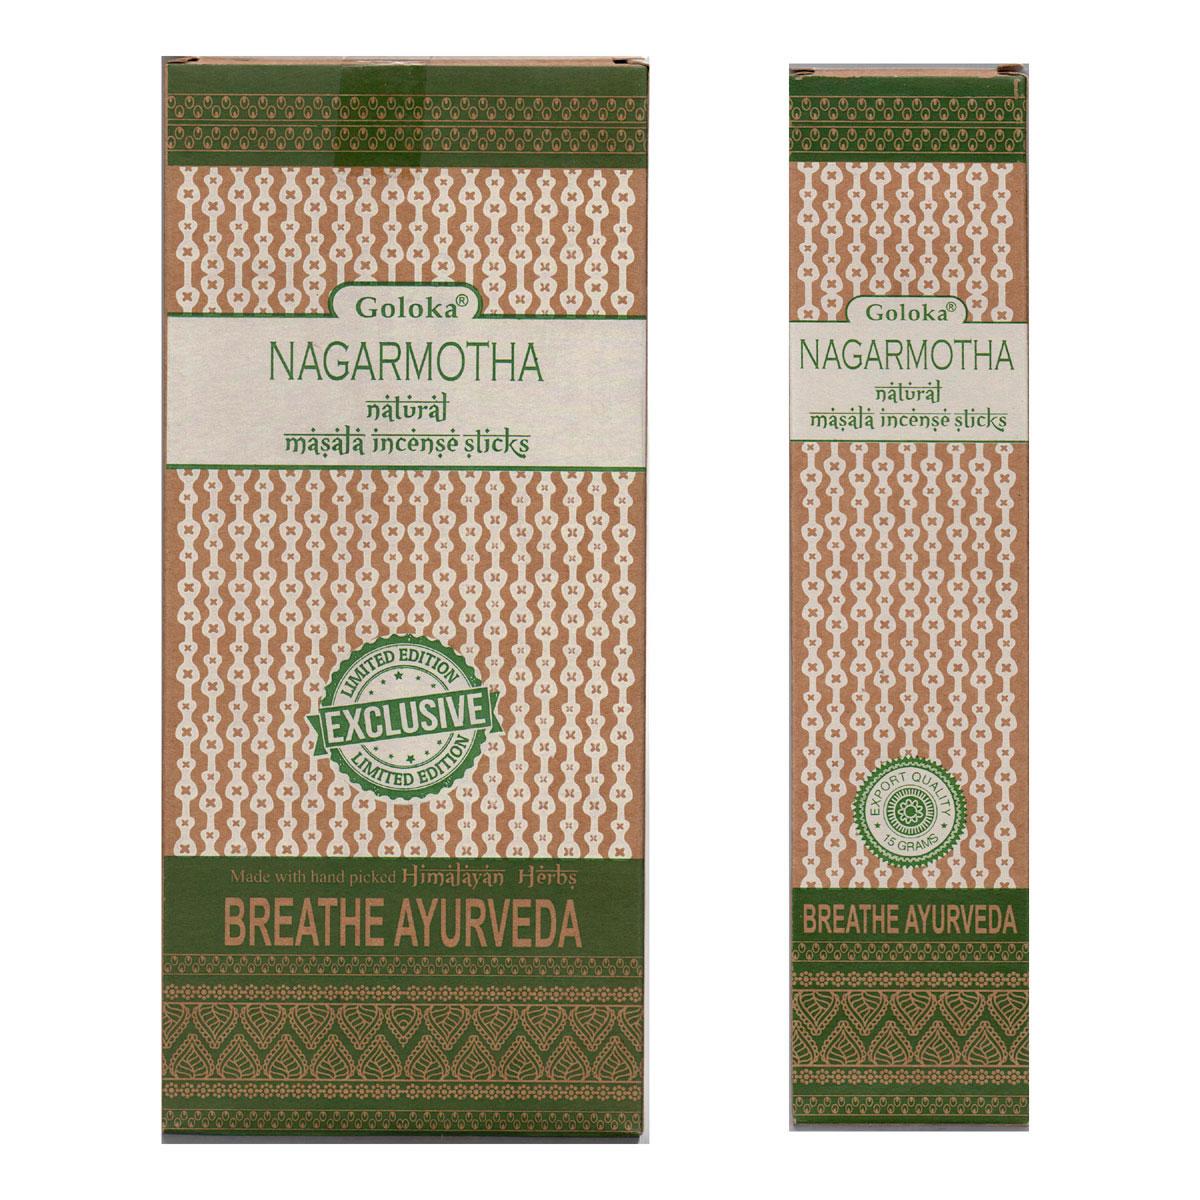 Goloka Ayurveda Incense - NAGARMOTHA